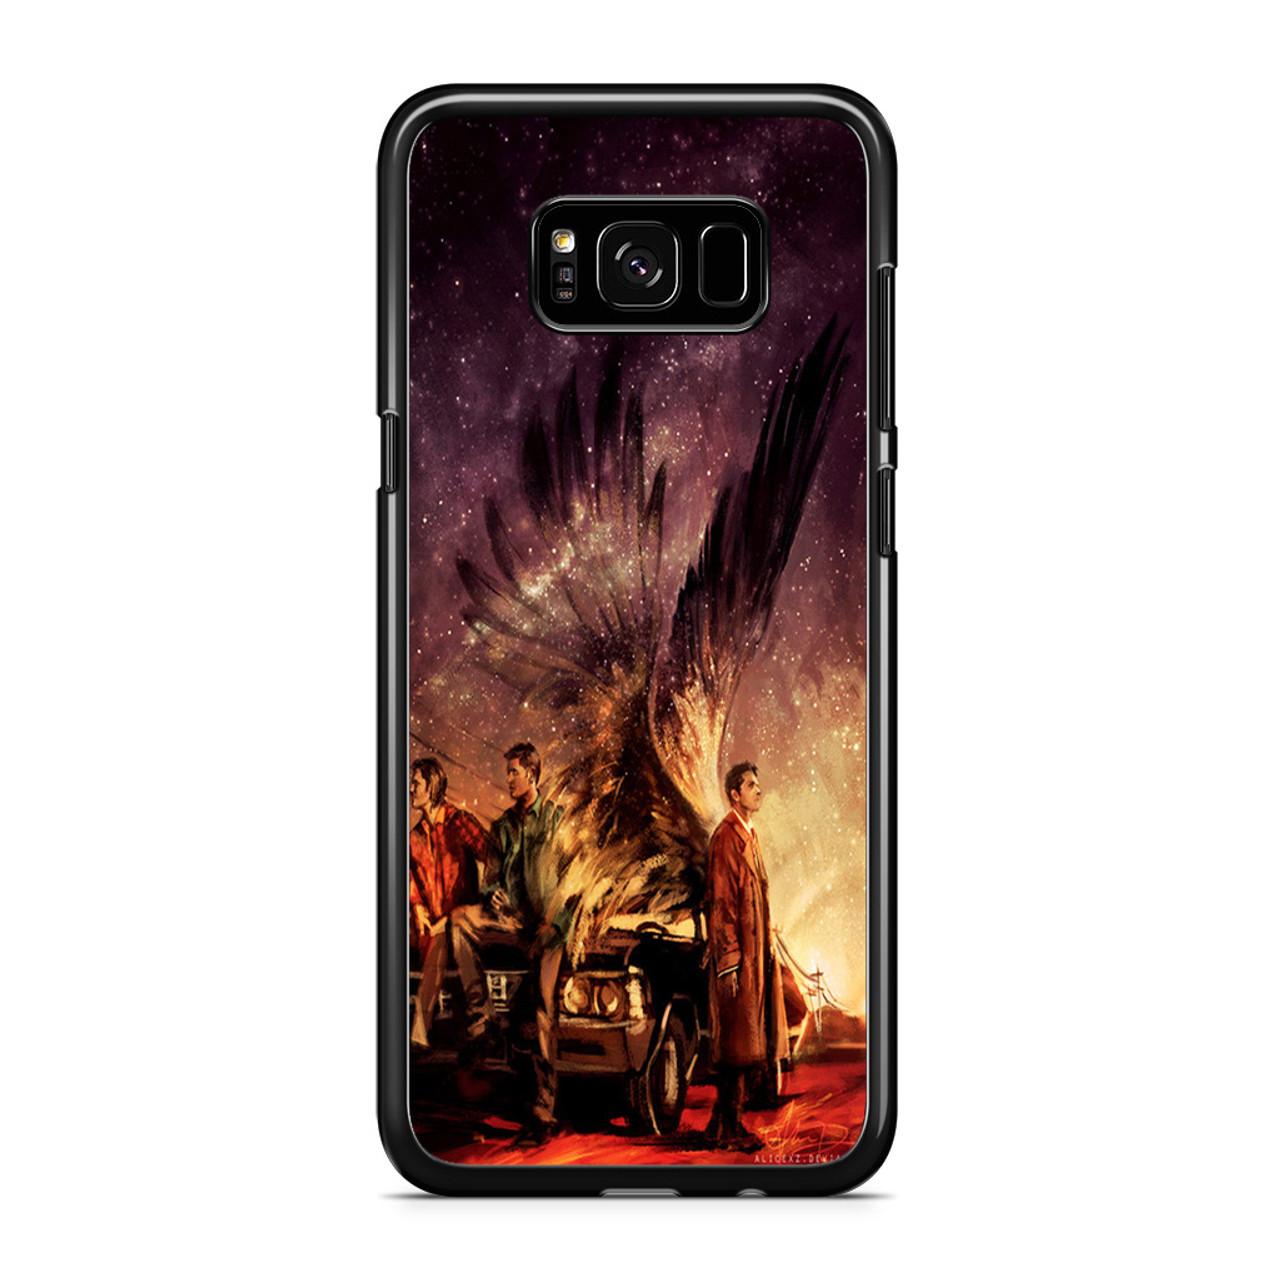 brand new 8eb41 2635d Supernatural Painting Art Samsung Galaxy S8 Case